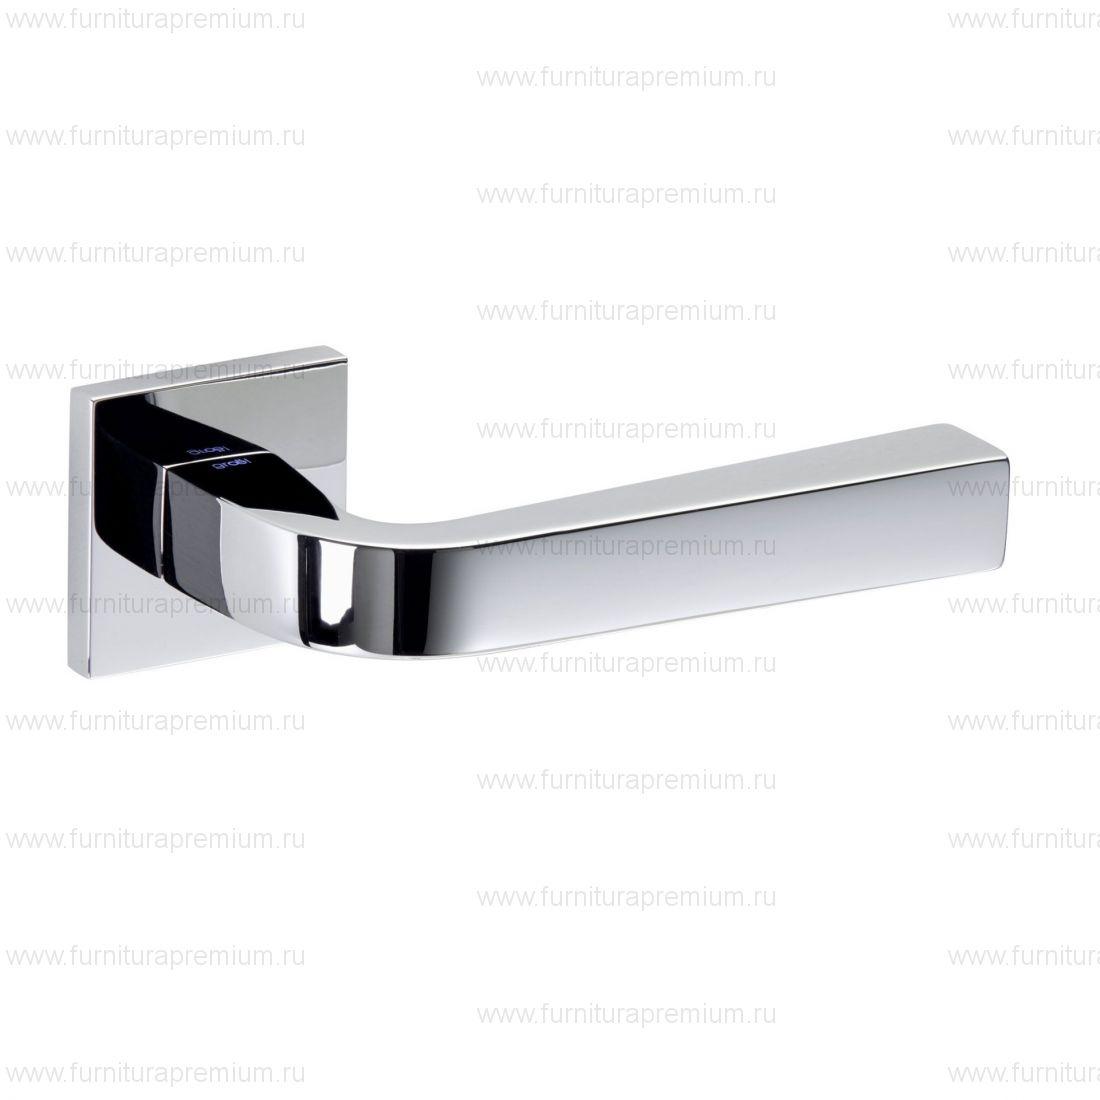 Ручка Groel 134 q Touch